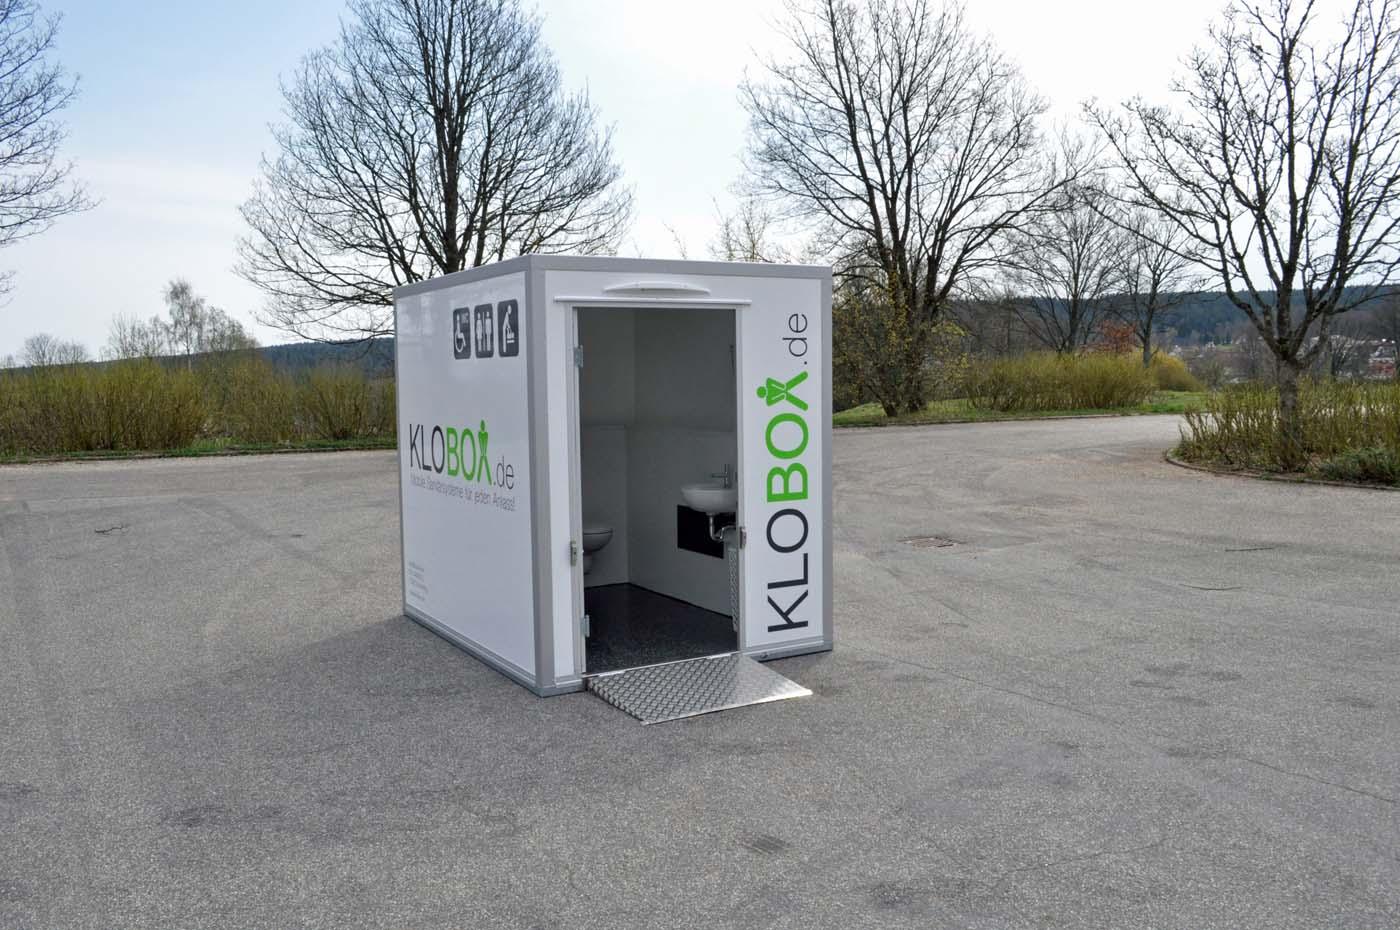 KLOBOX 250 [KX-1702] #05